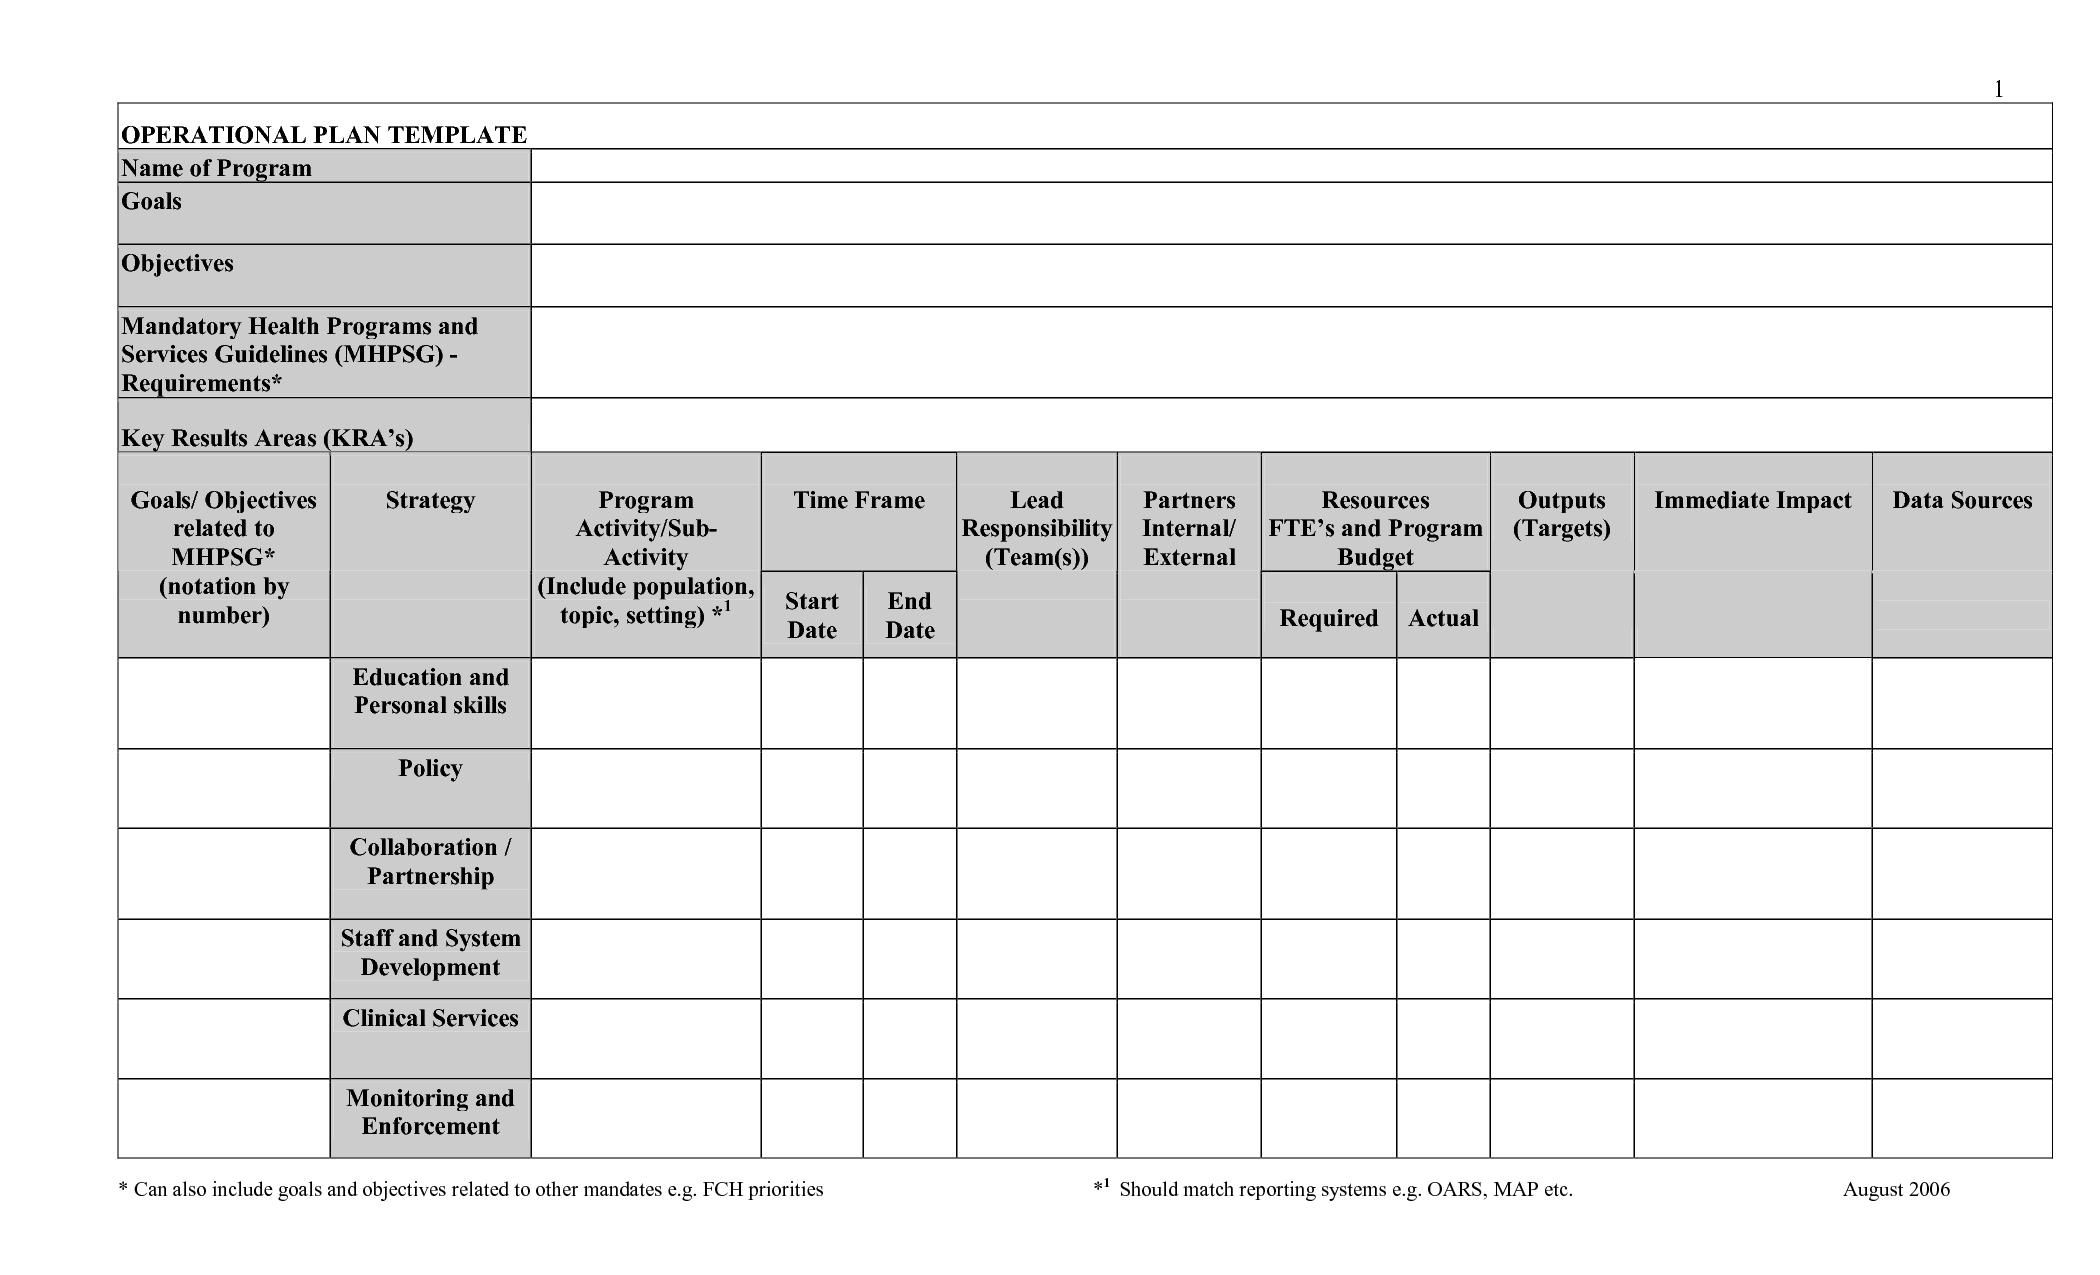 operational plan template word Toma.daretodonate.co